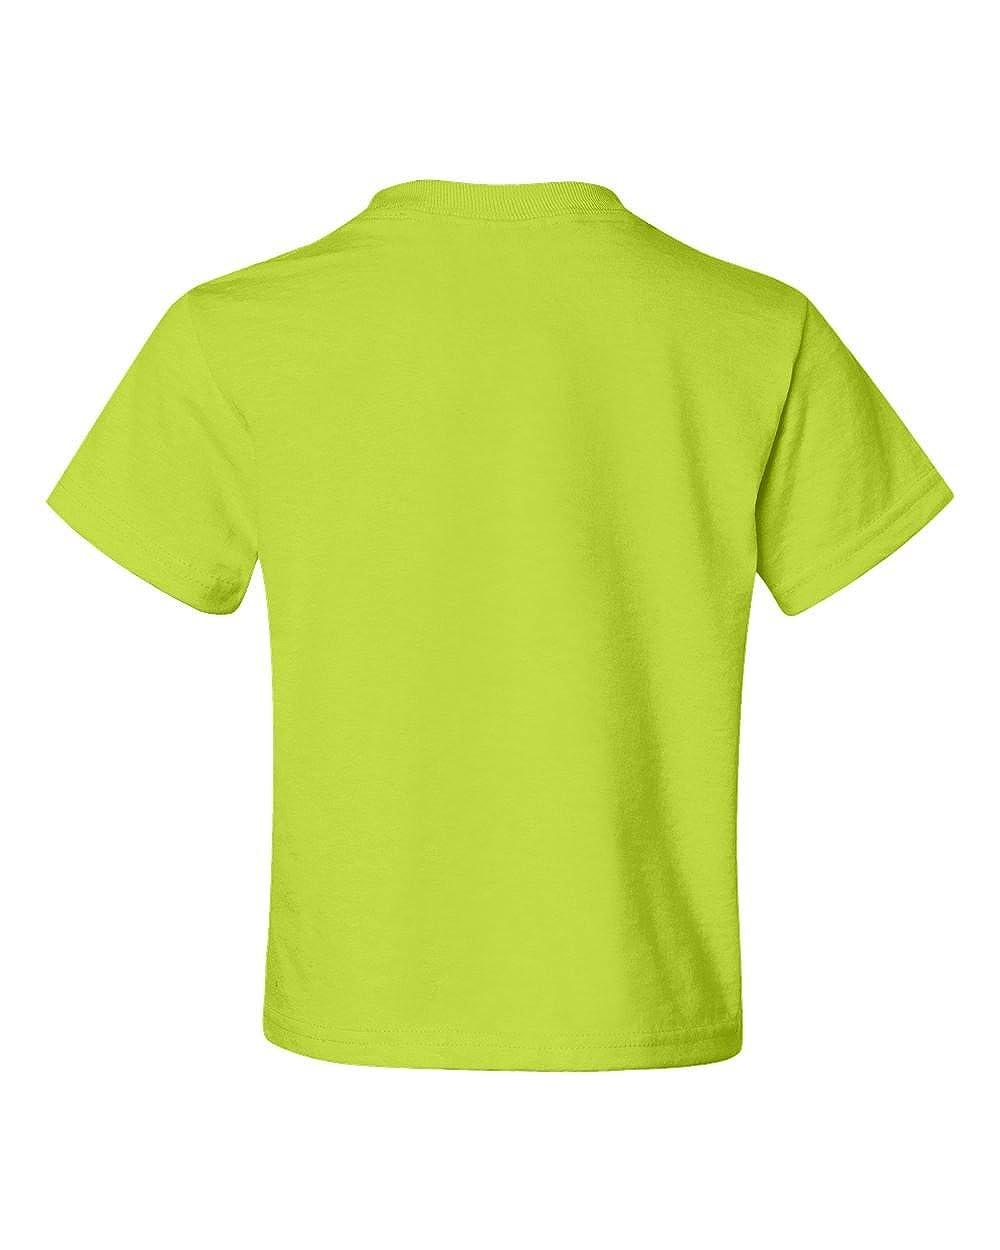 Jerzees Big Boys Rib Collar Tear Away Label T-Shirt